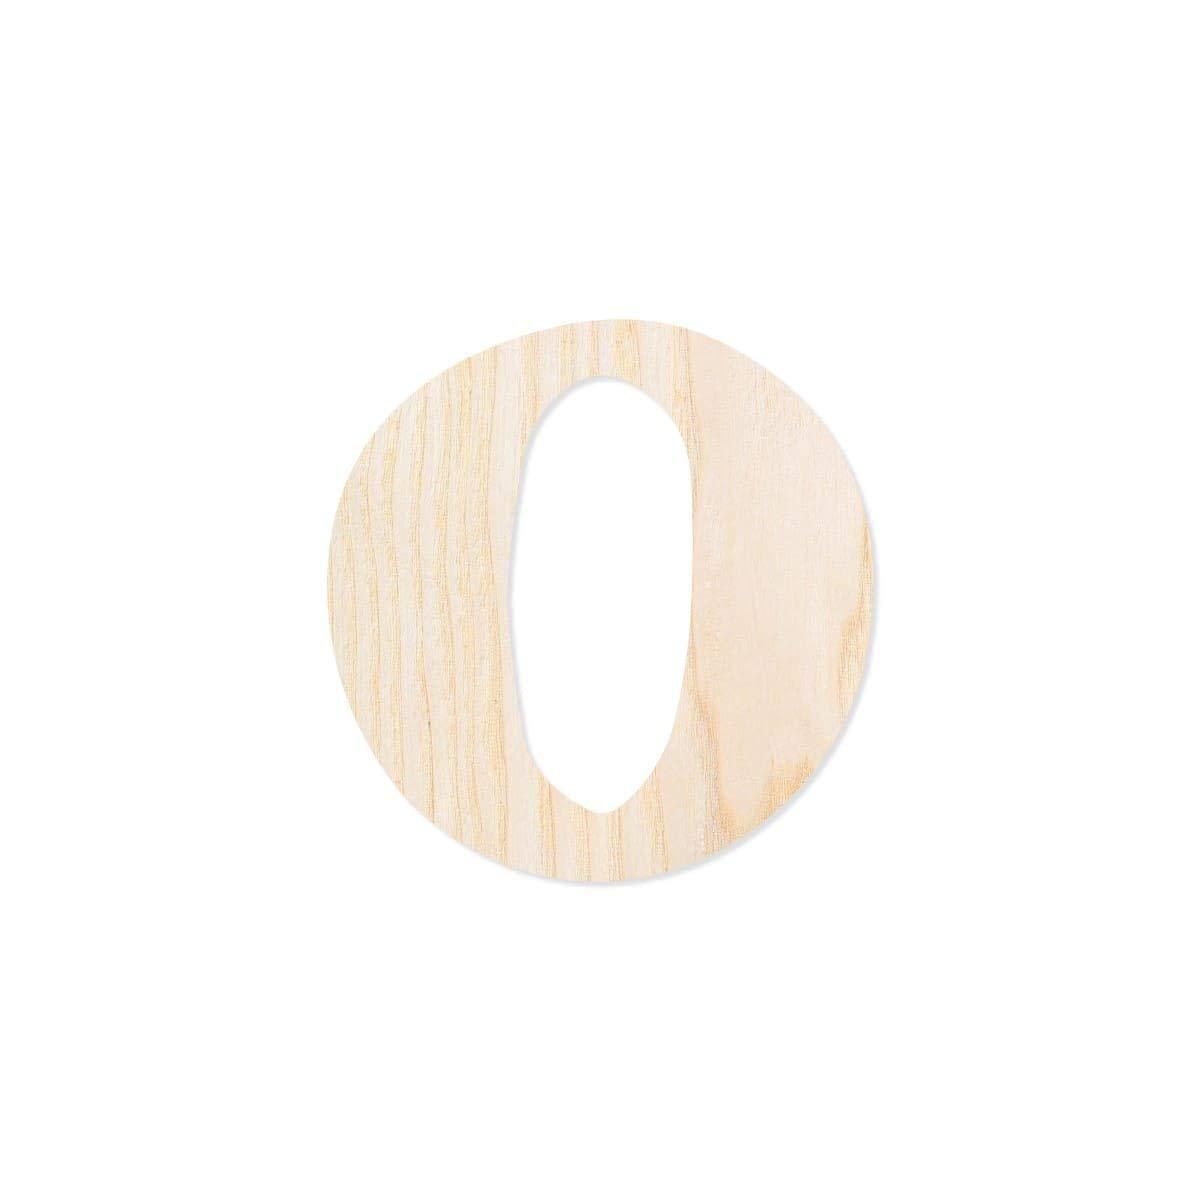 B/ütic GmbH Holz-Furnier Buchstaben Buchstaben:Eszett Magnolia Gr/ö/ße:5cm Gr/ö/ßenauswahl Schriftzug aus hellem 0,6mm Echtholzfurnier